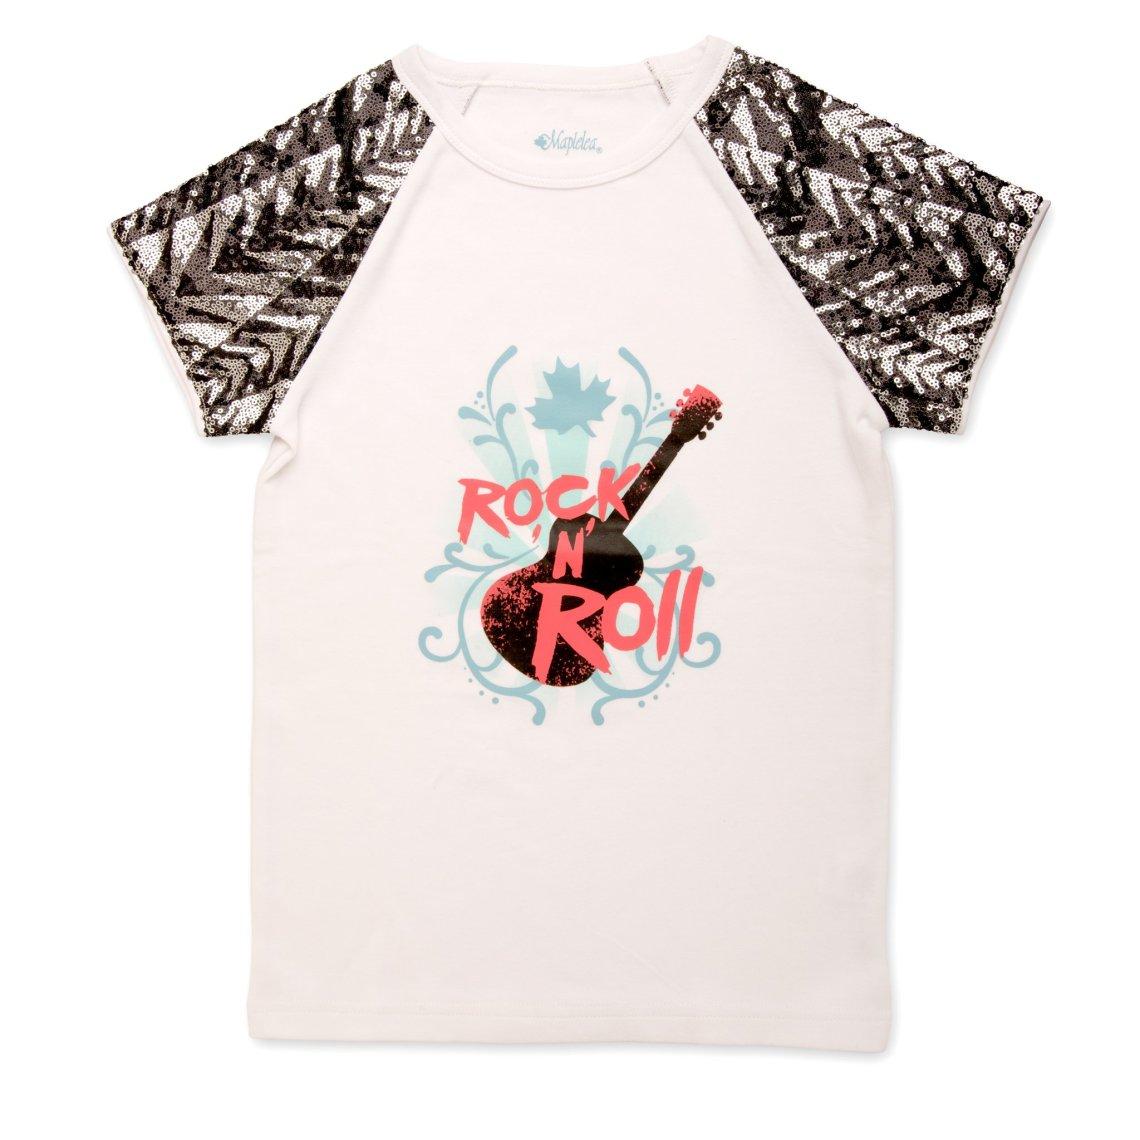 KL15G_Rockin_Couture_Flat